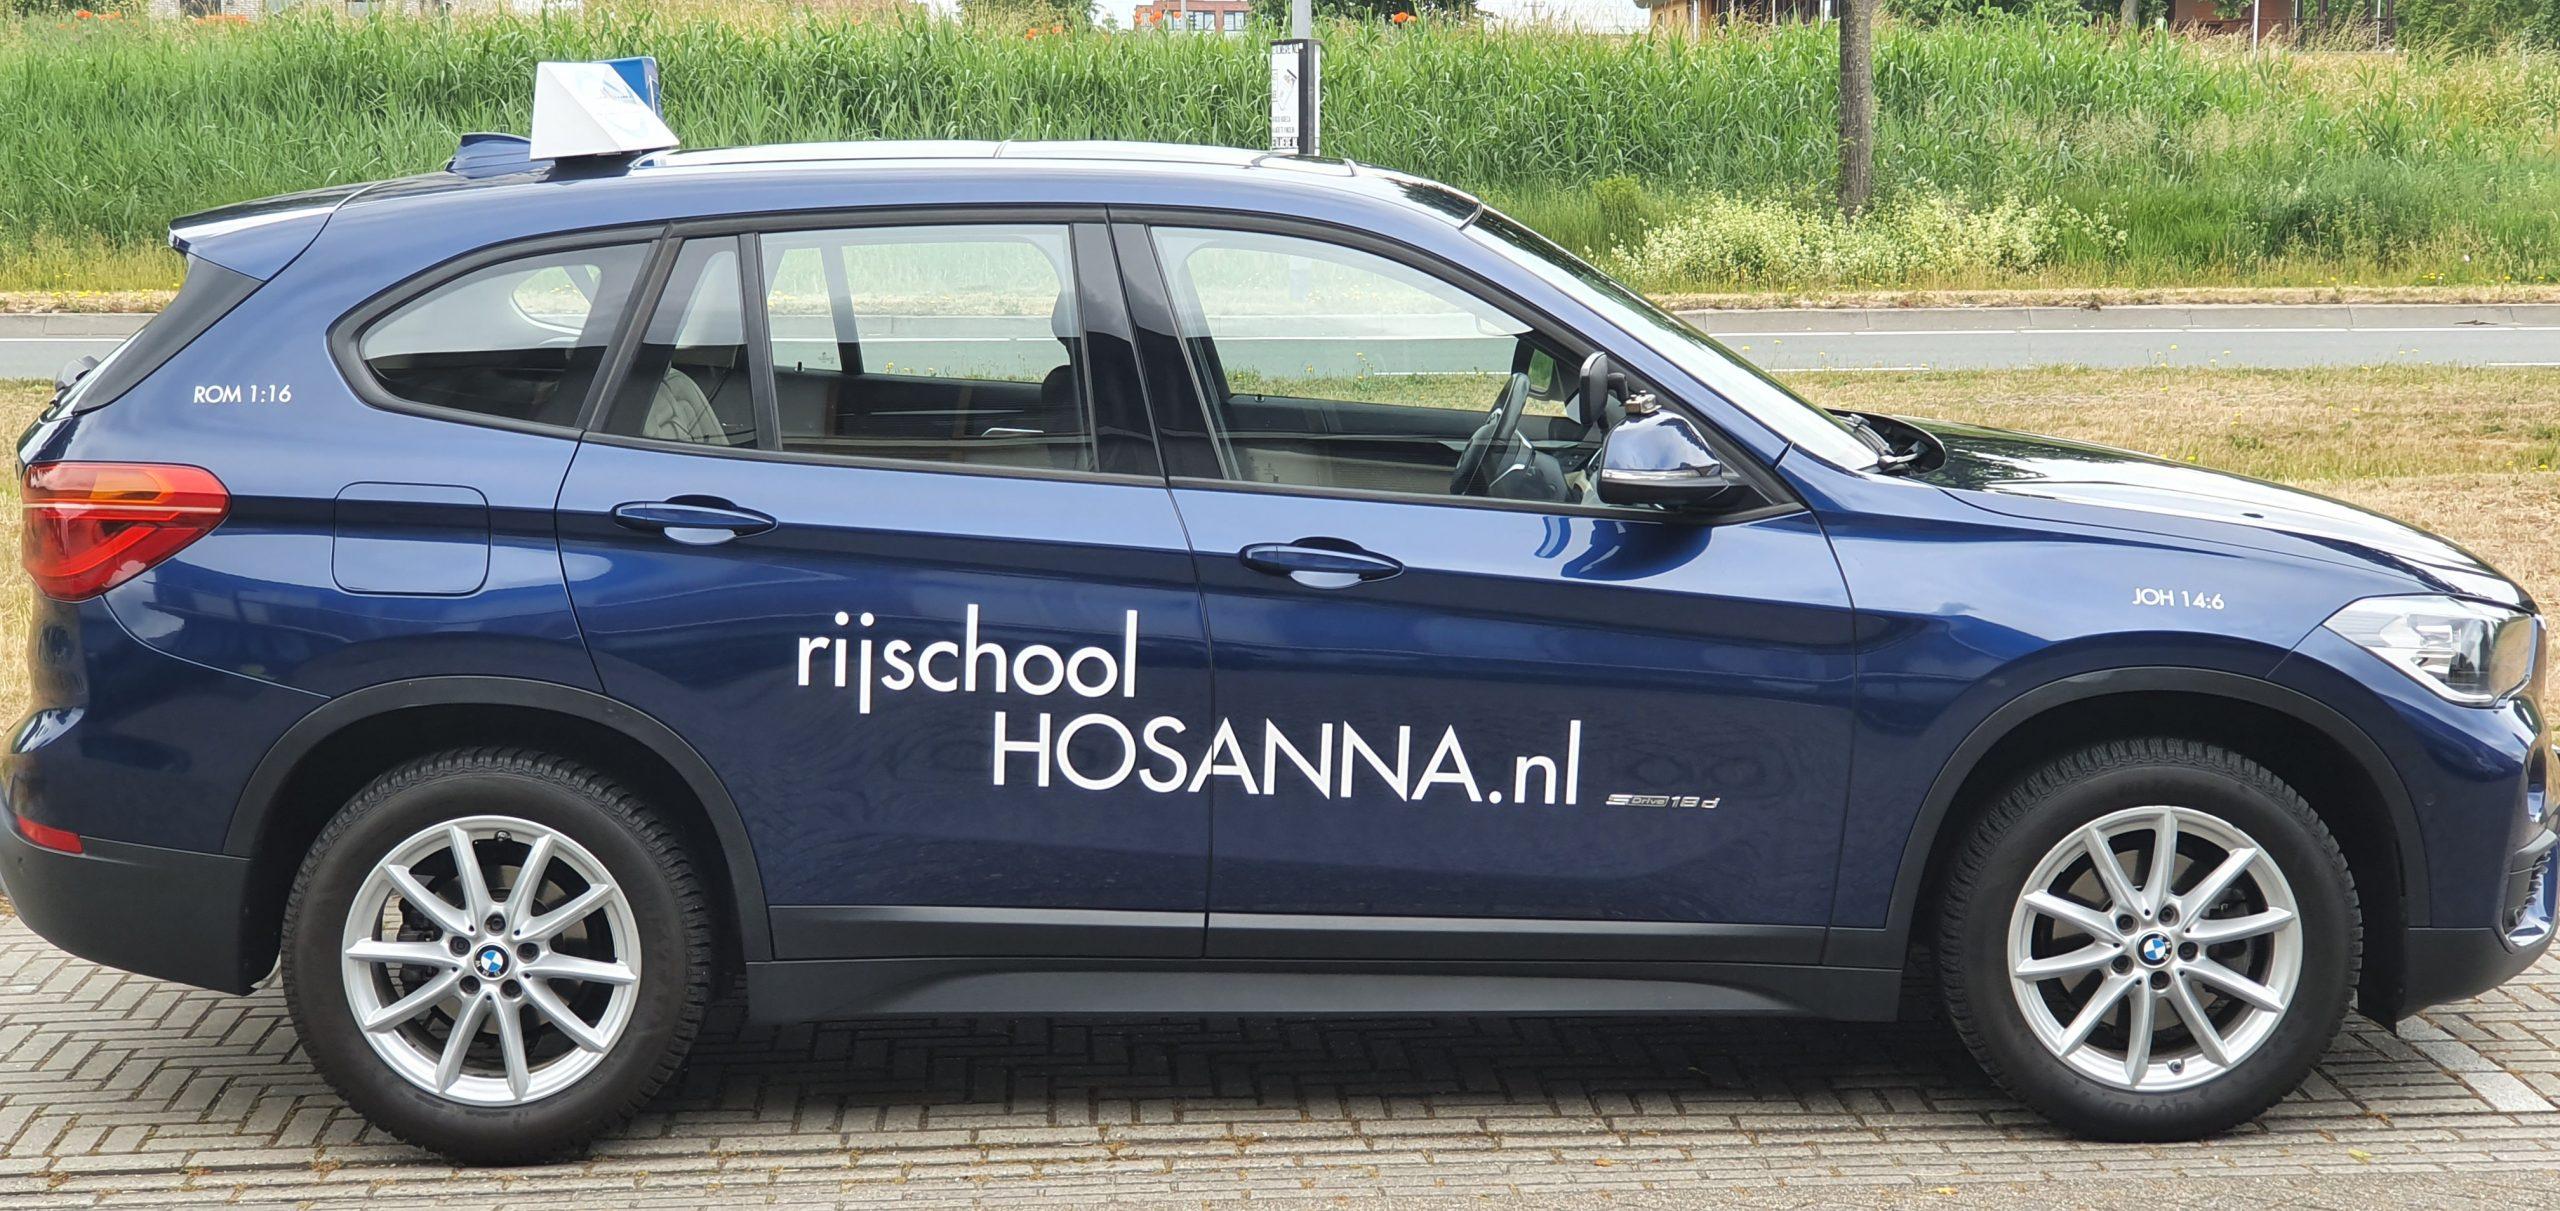 Rijschool Hosanna